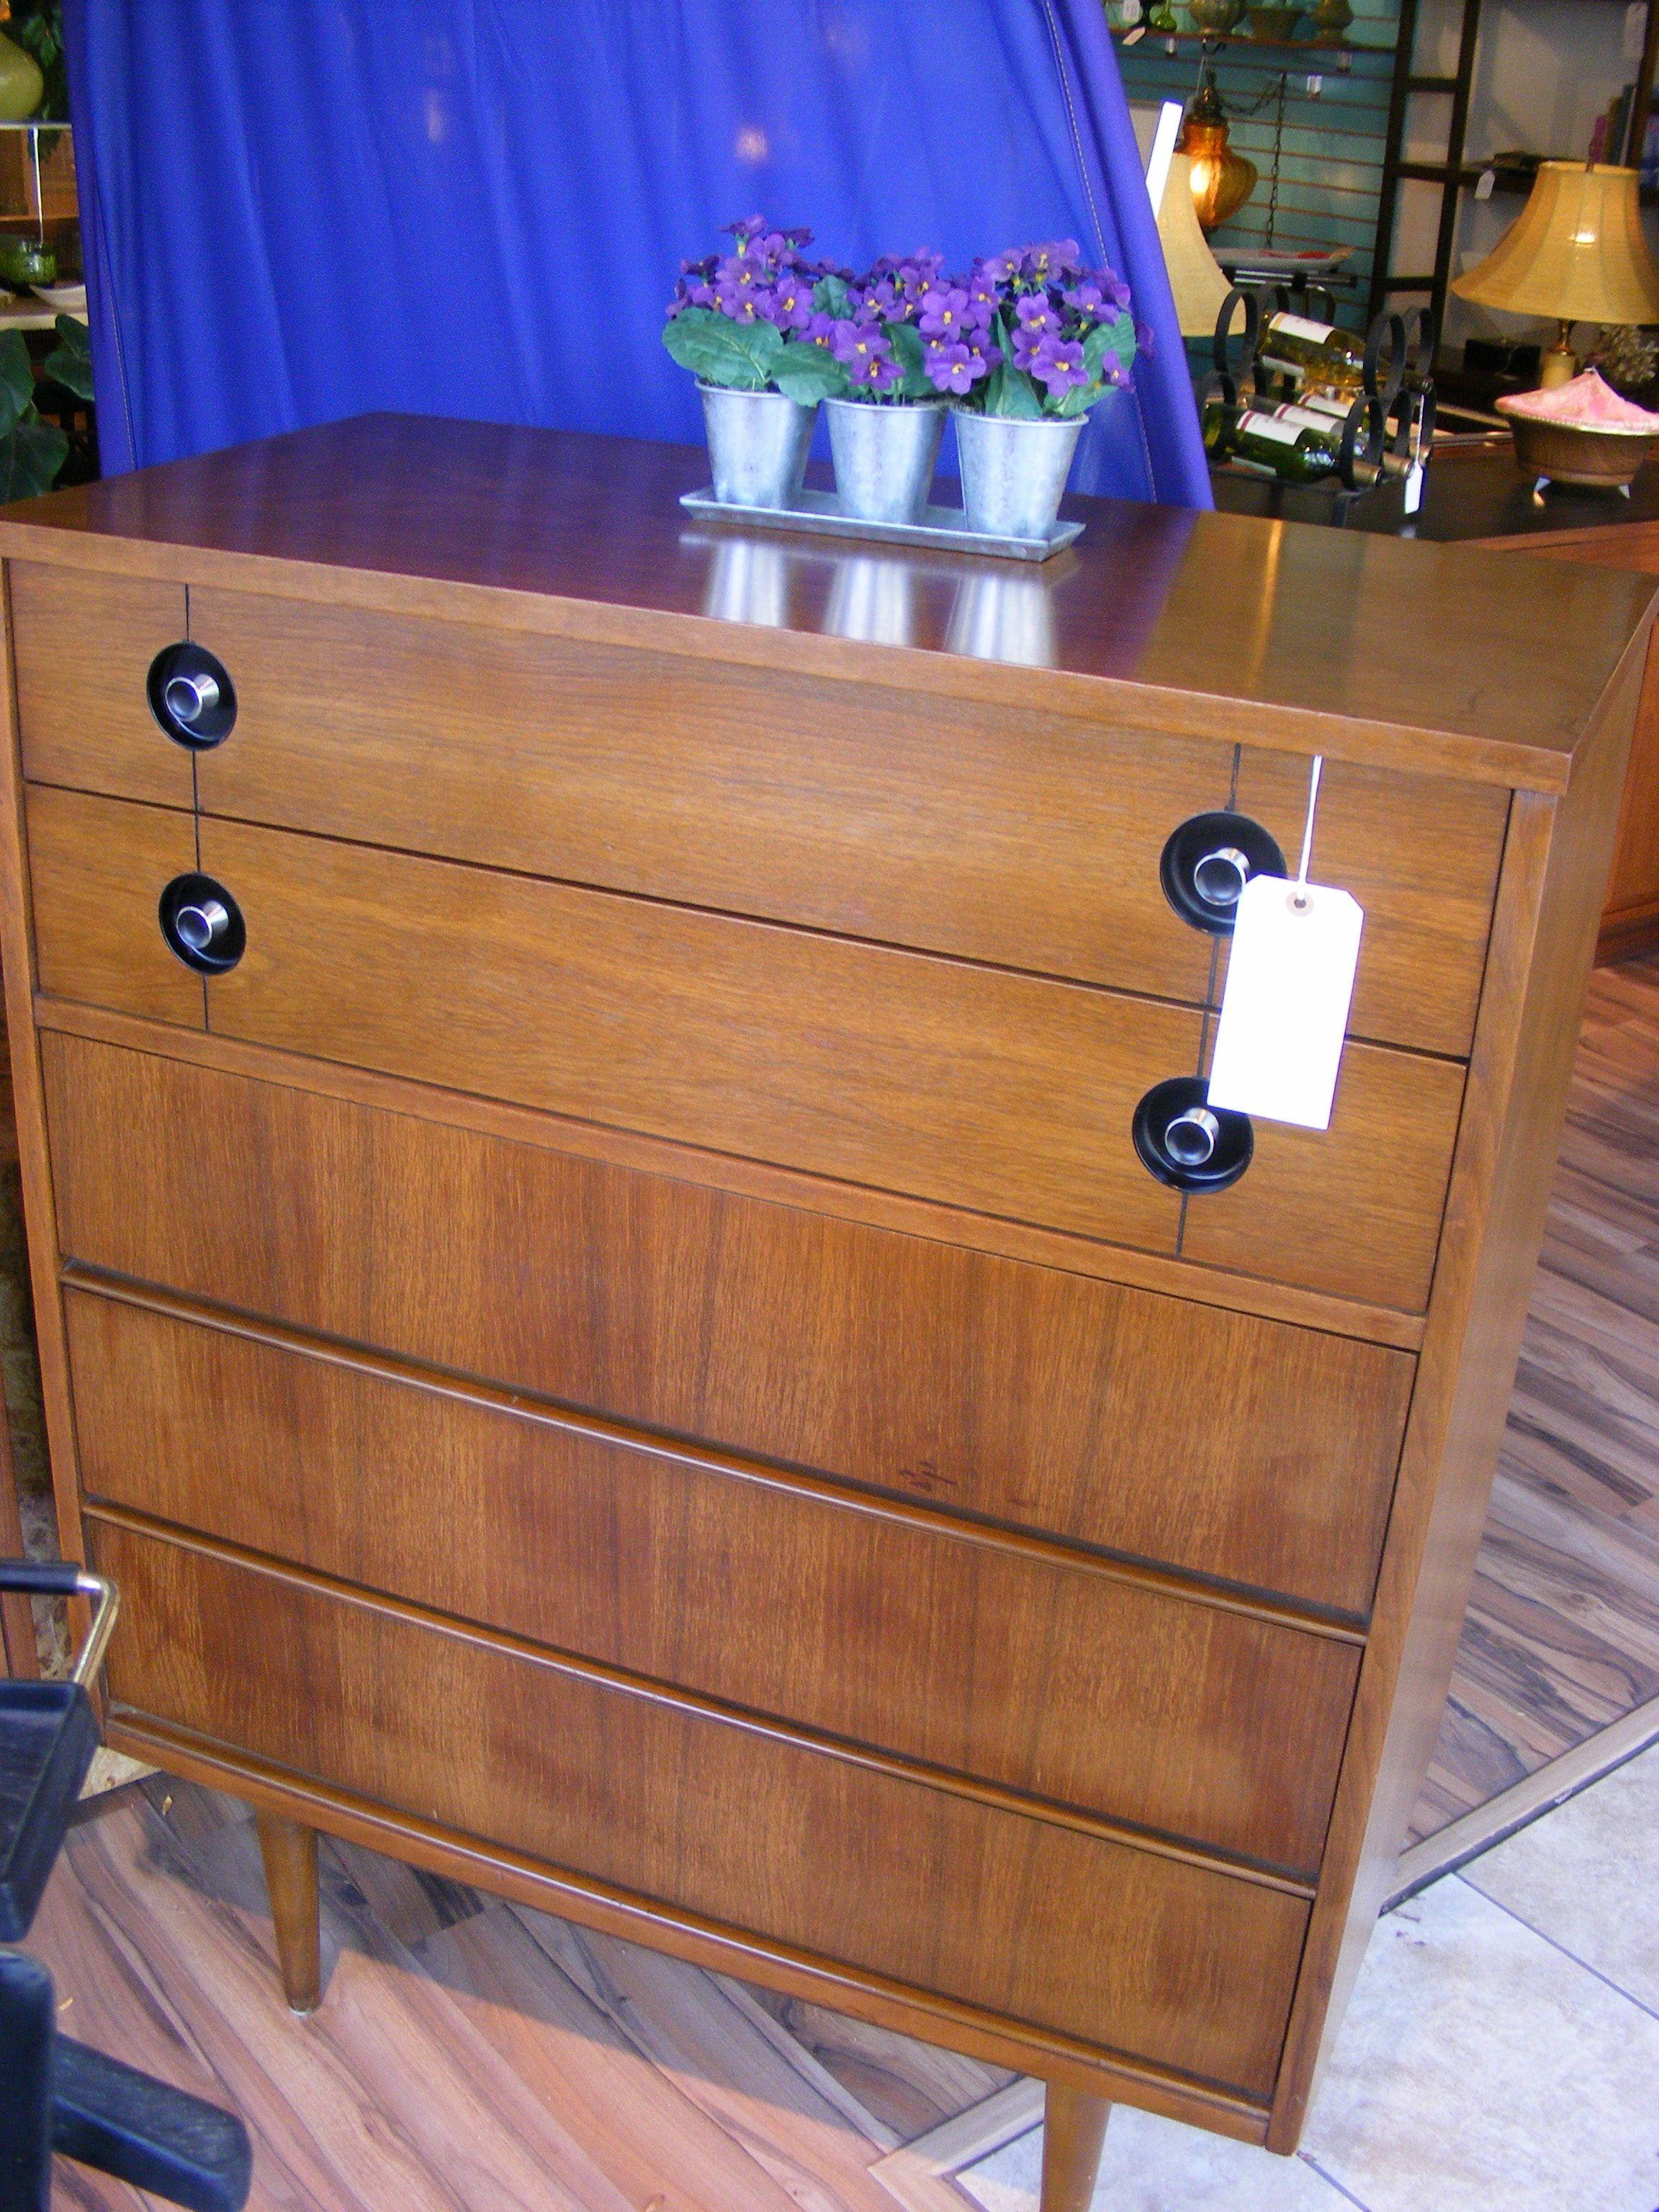 1963 Stanley Furniture Co. Tall Dresser ! So MCM! U2014 At Retro Kalamazoo.